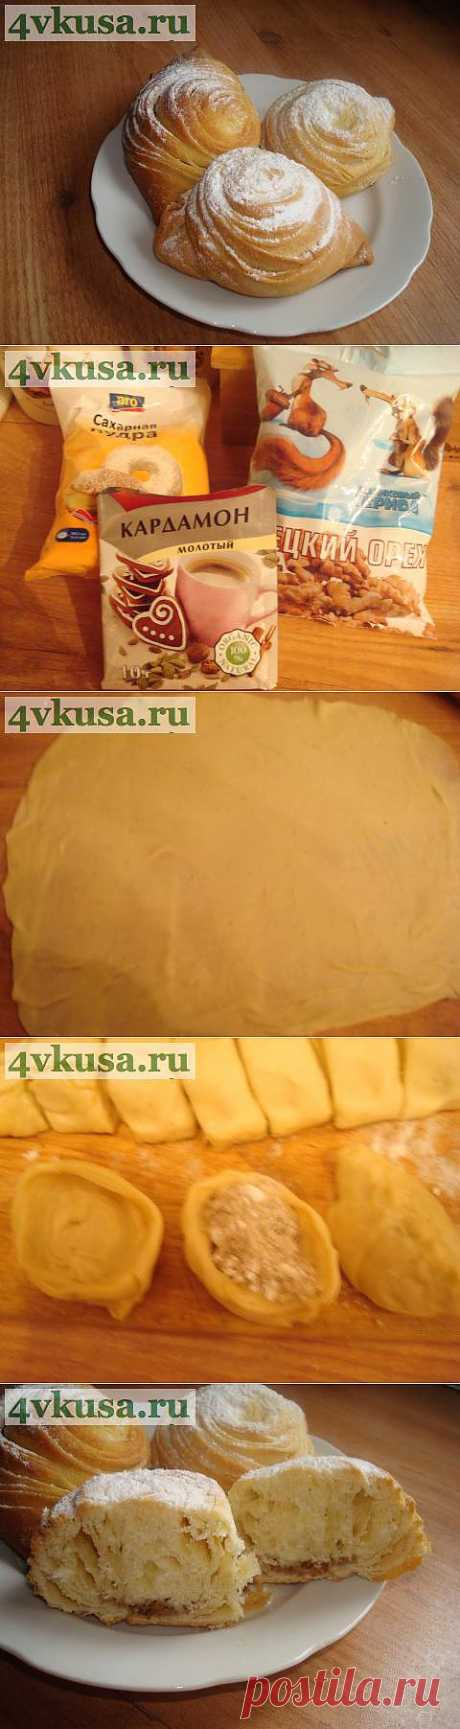 БАДАМБУРА   4vkusa.ru